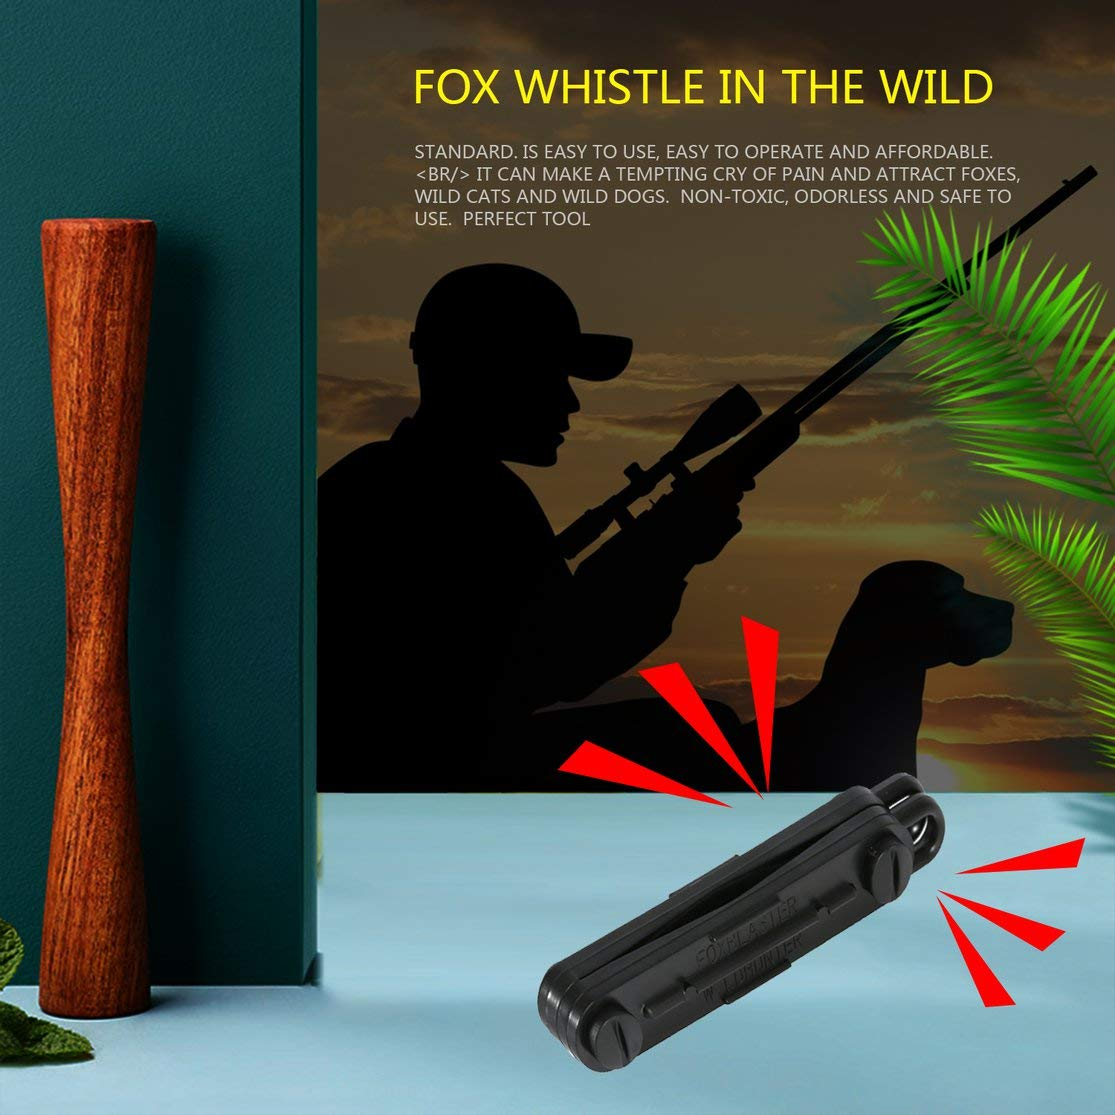 CHANNIKO-FR Black Outdoor Fox Down Fox Blaster Appel Sifflet Predator Chasse Lamping Appelant Lapin Jeu Appelant Animial